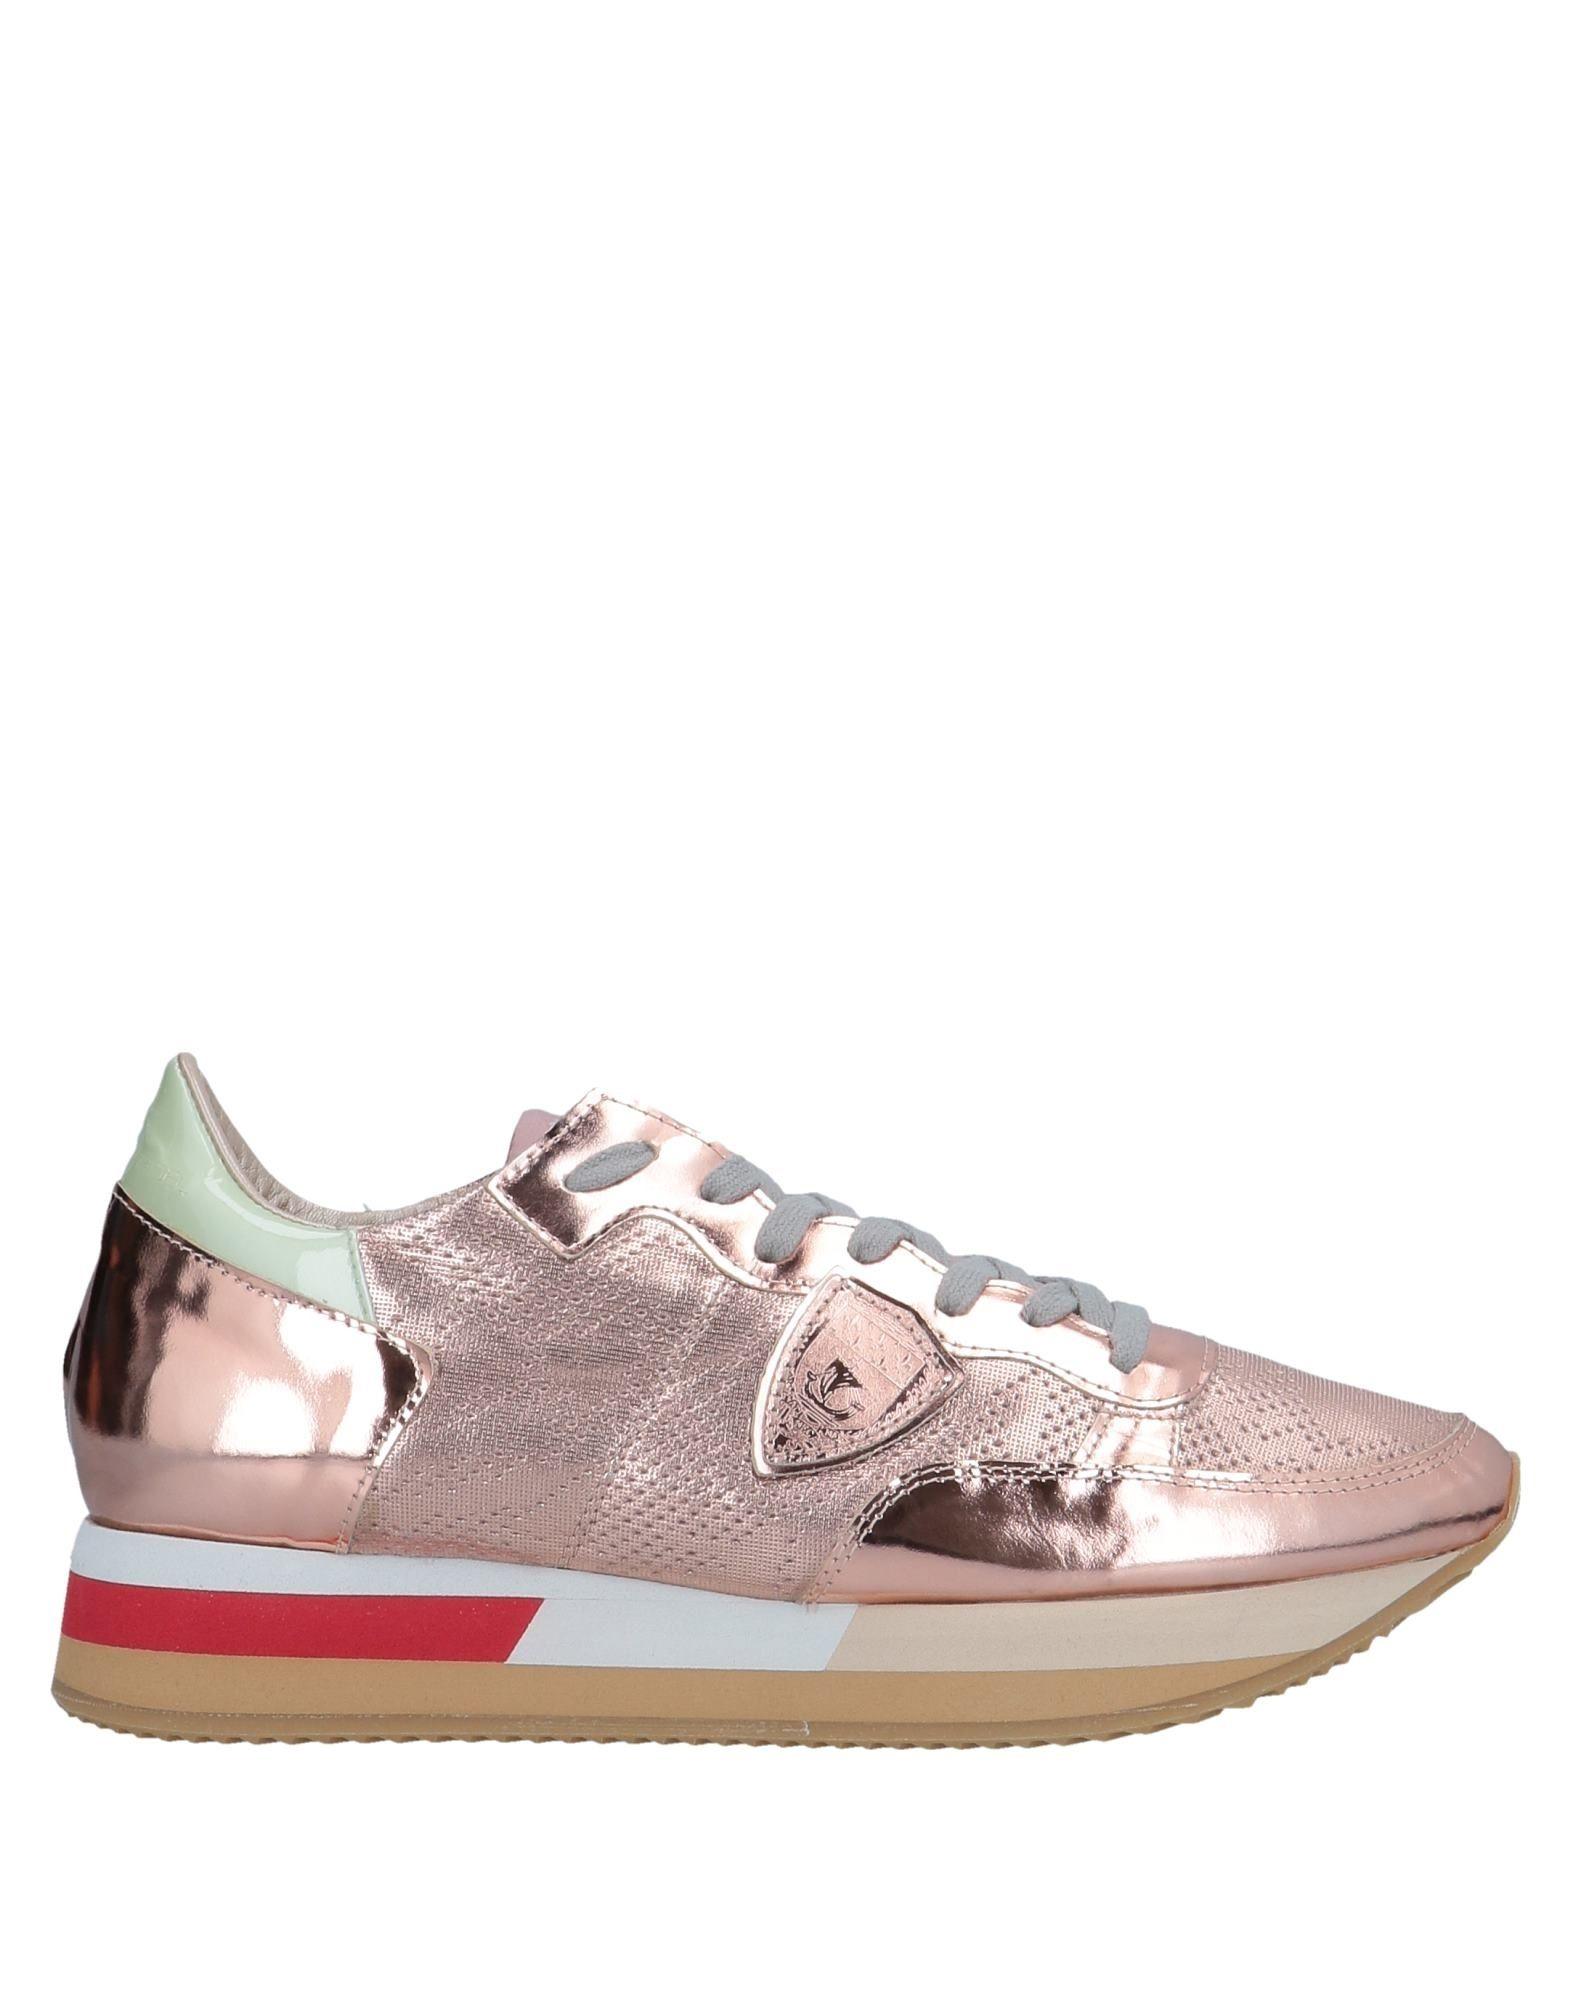 Philippe Model Sneakers - Women Philippe  Model Sneakers online on  Philippe Australia - 11564910KK 340209